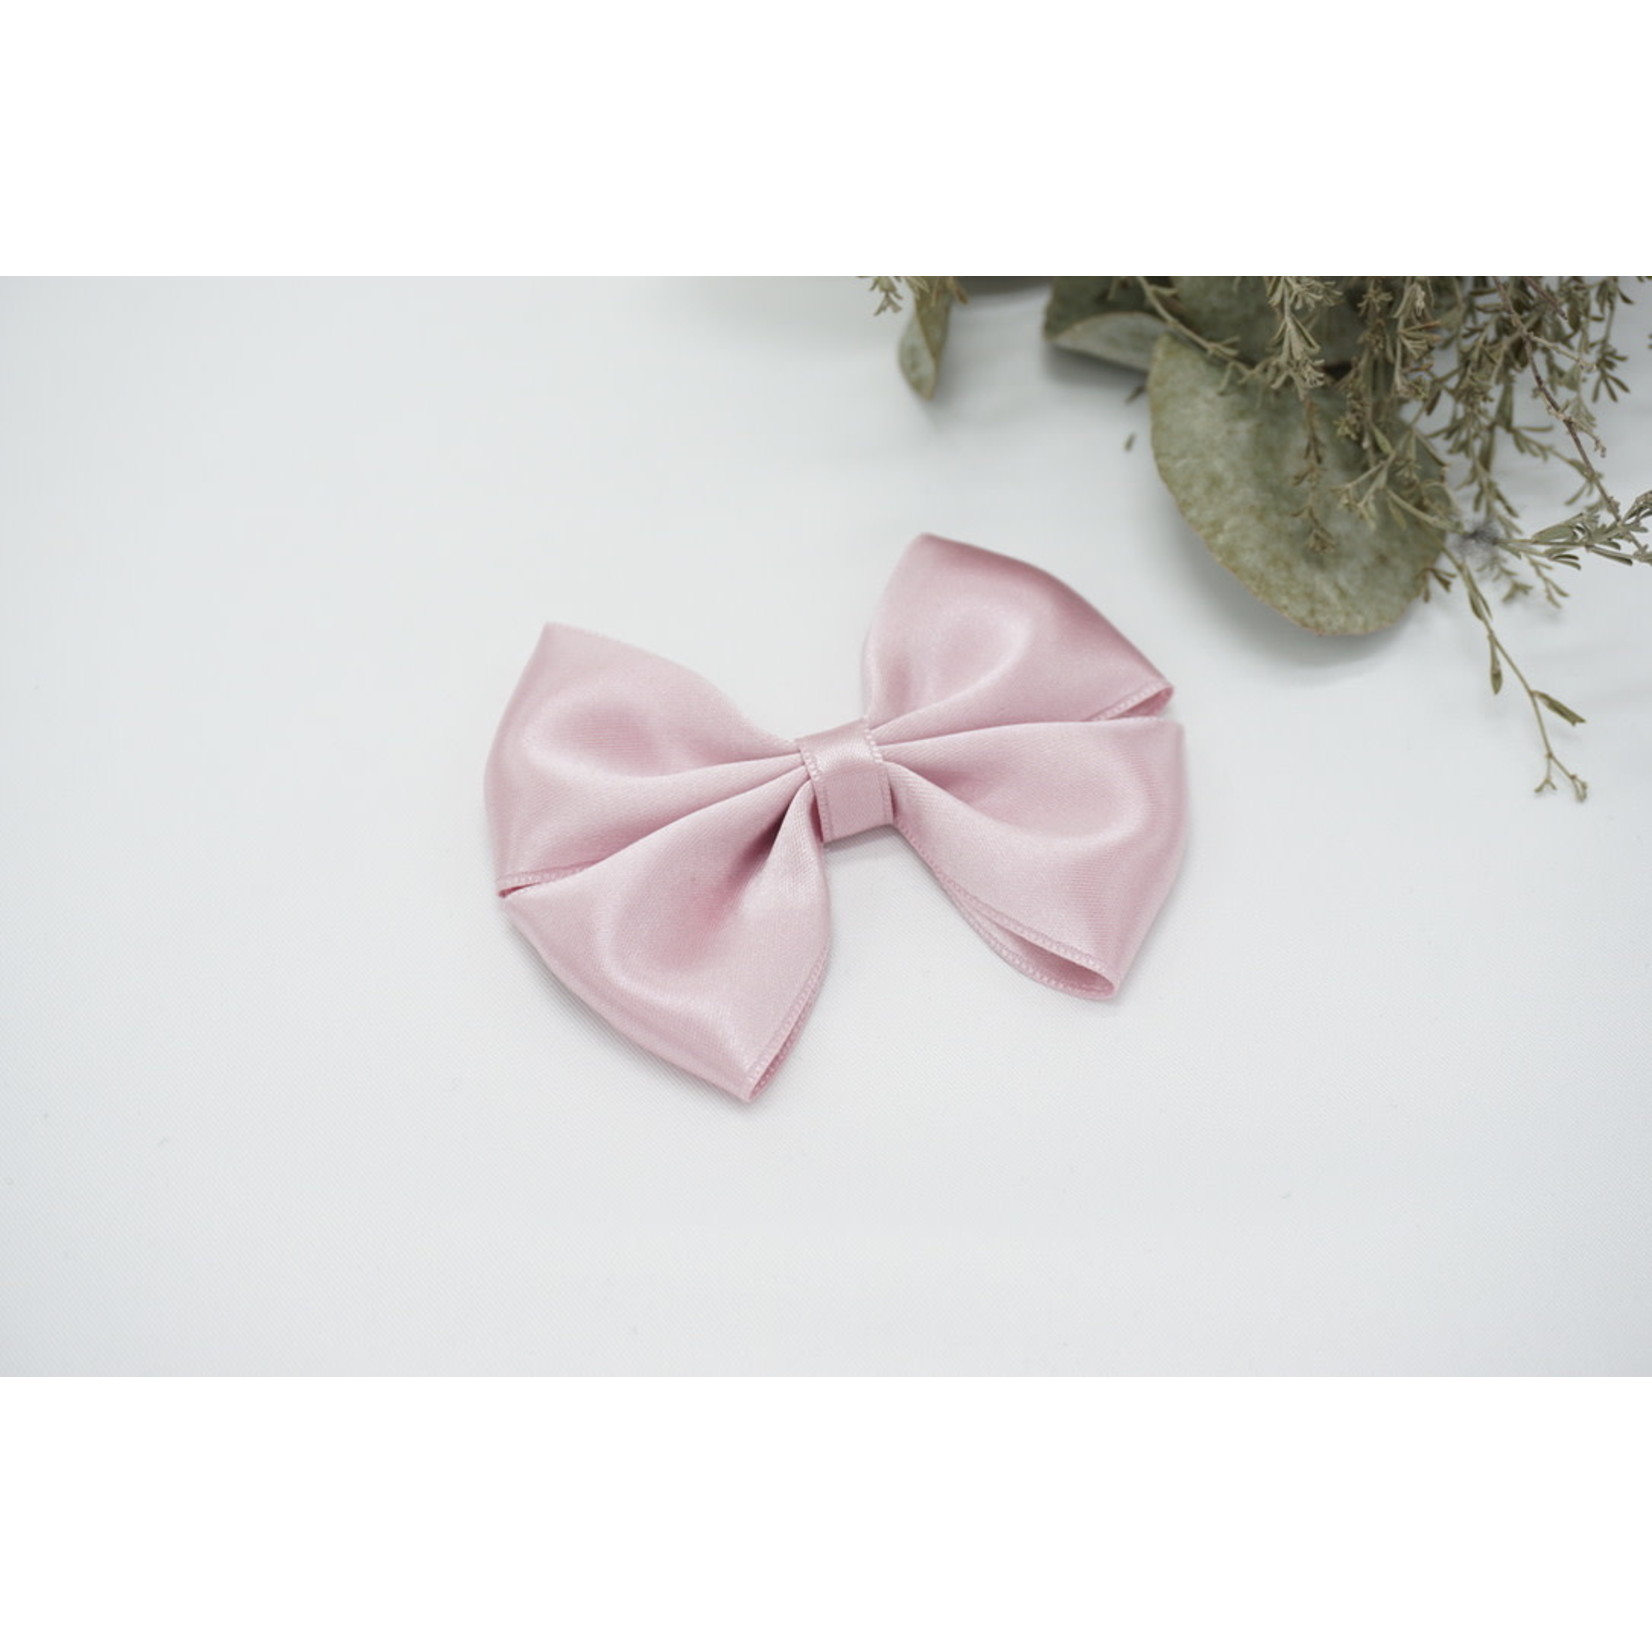 Petite Zara Satin Bow - Misty Rose